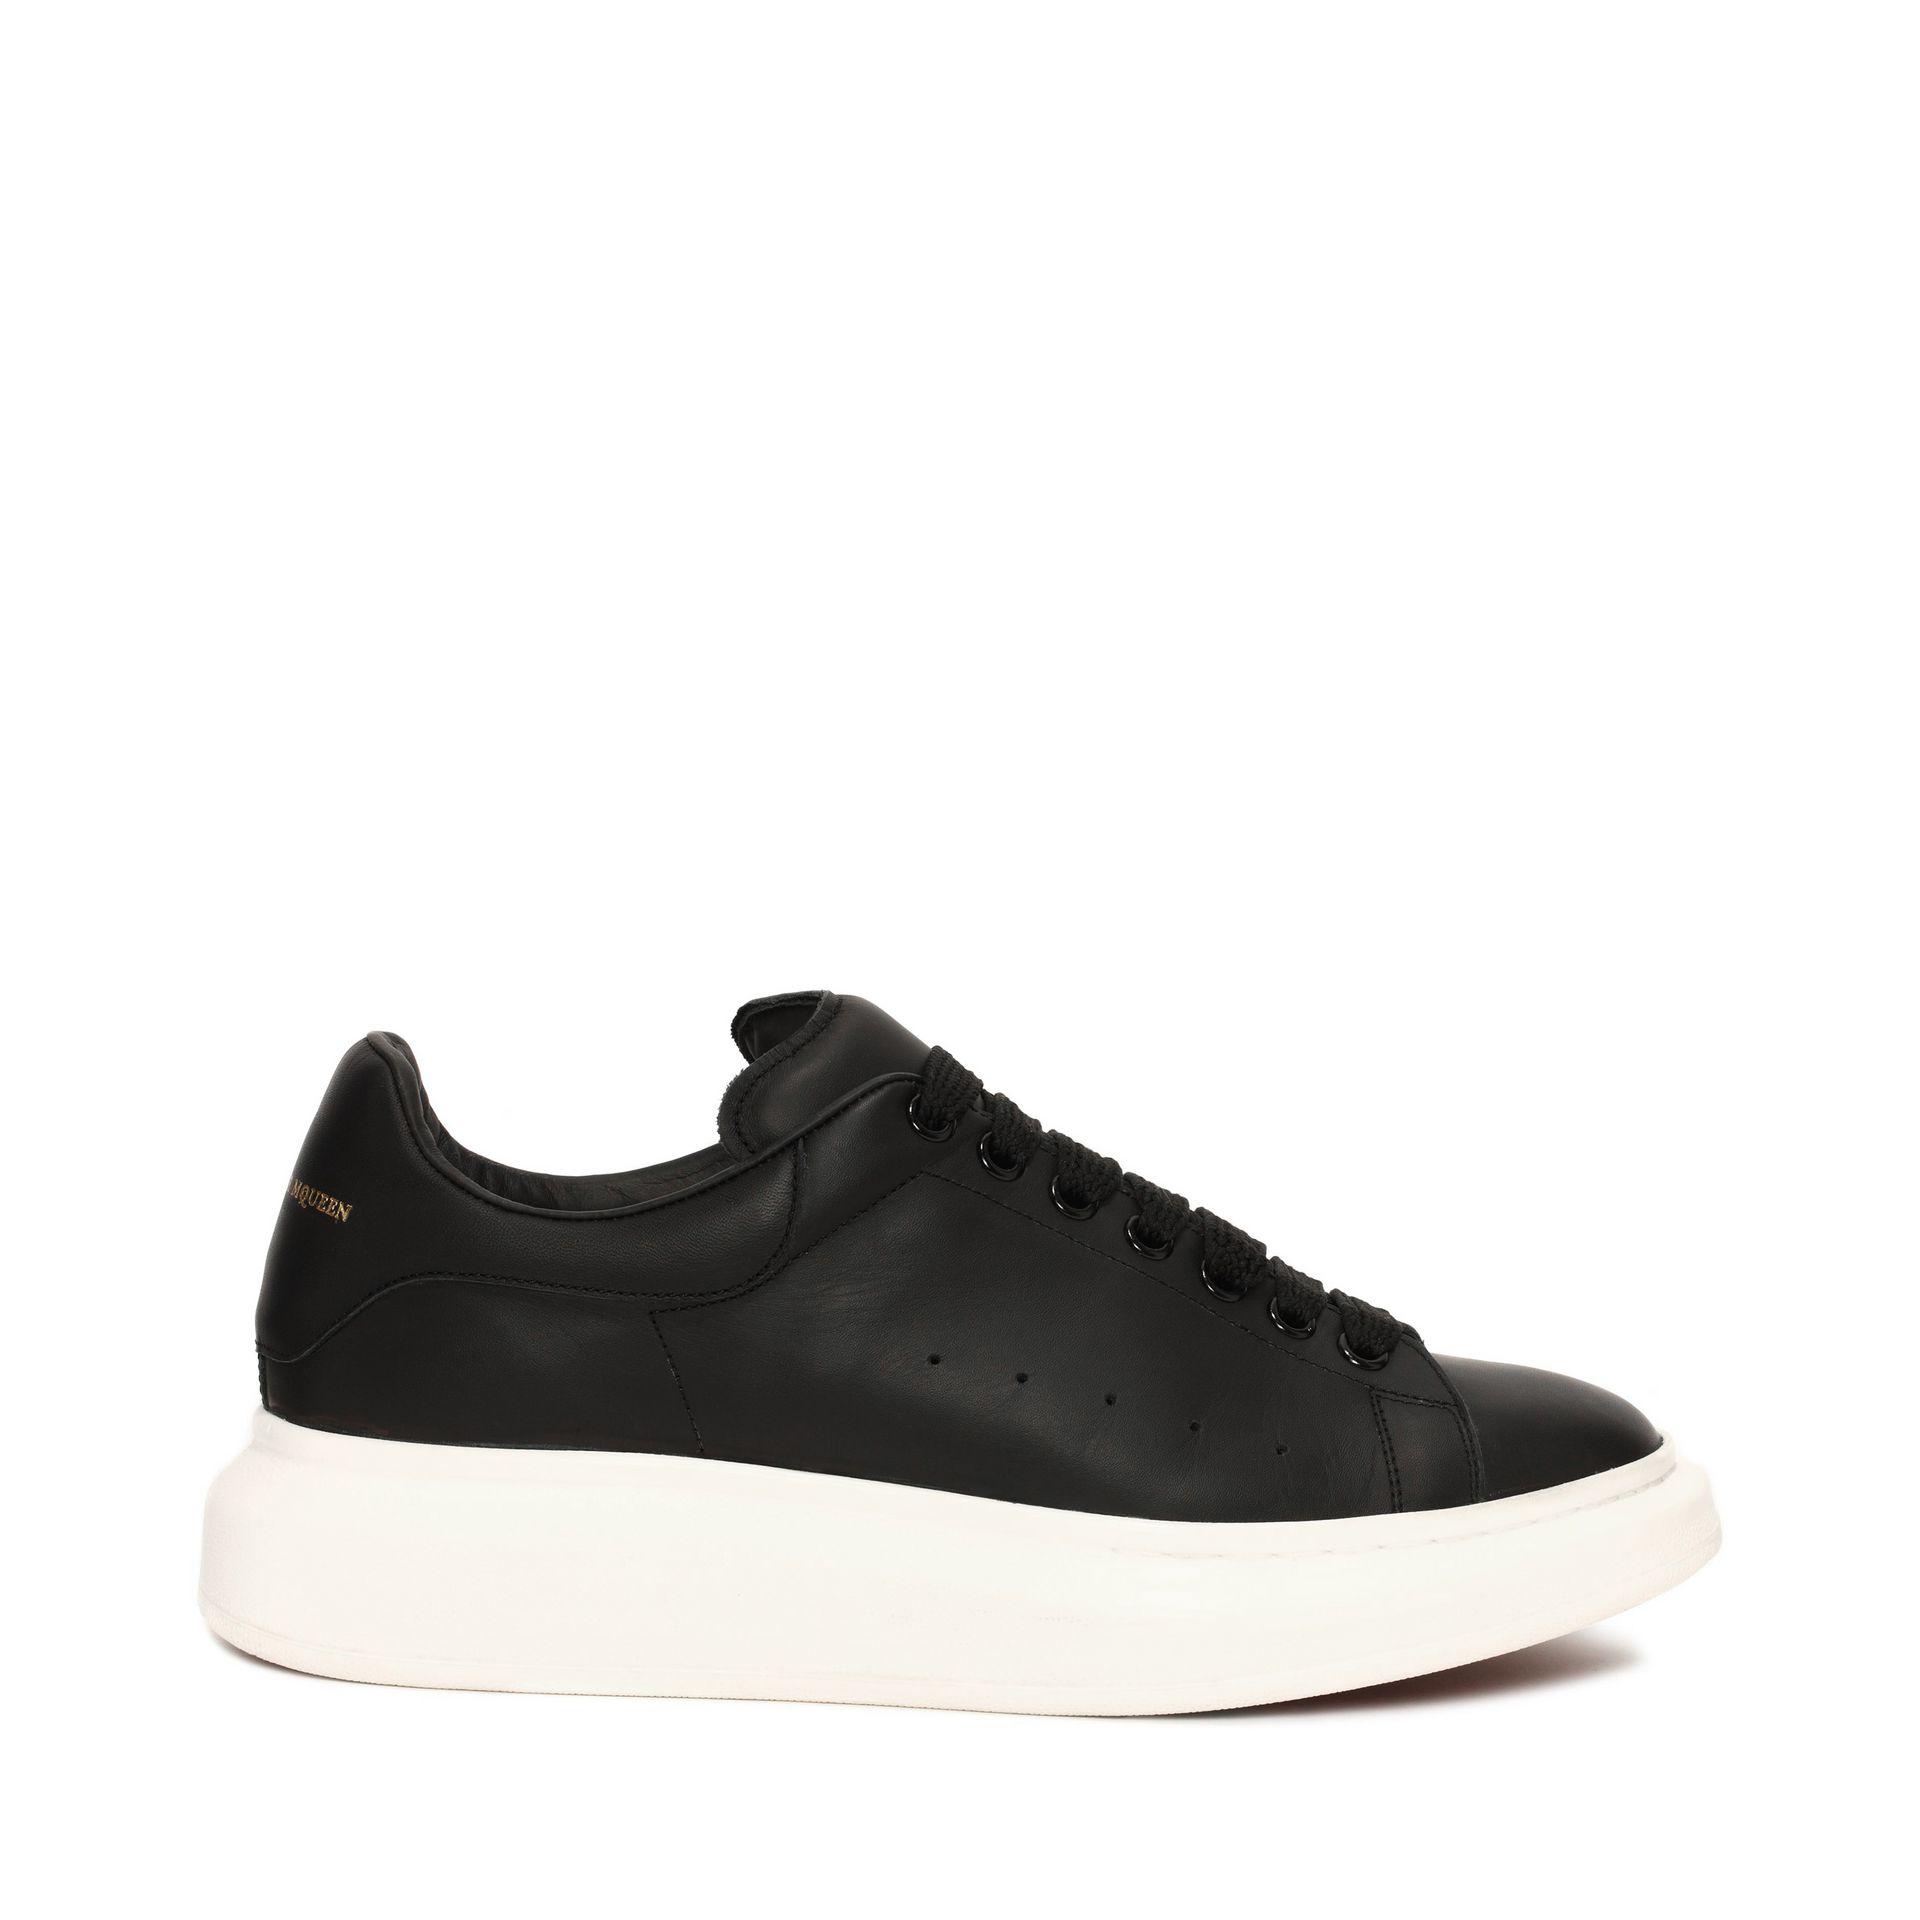 oversized sneaker alexander mcqueen sneakers shoes. Black Bedroom Furniture Sets. Home Design Ideas